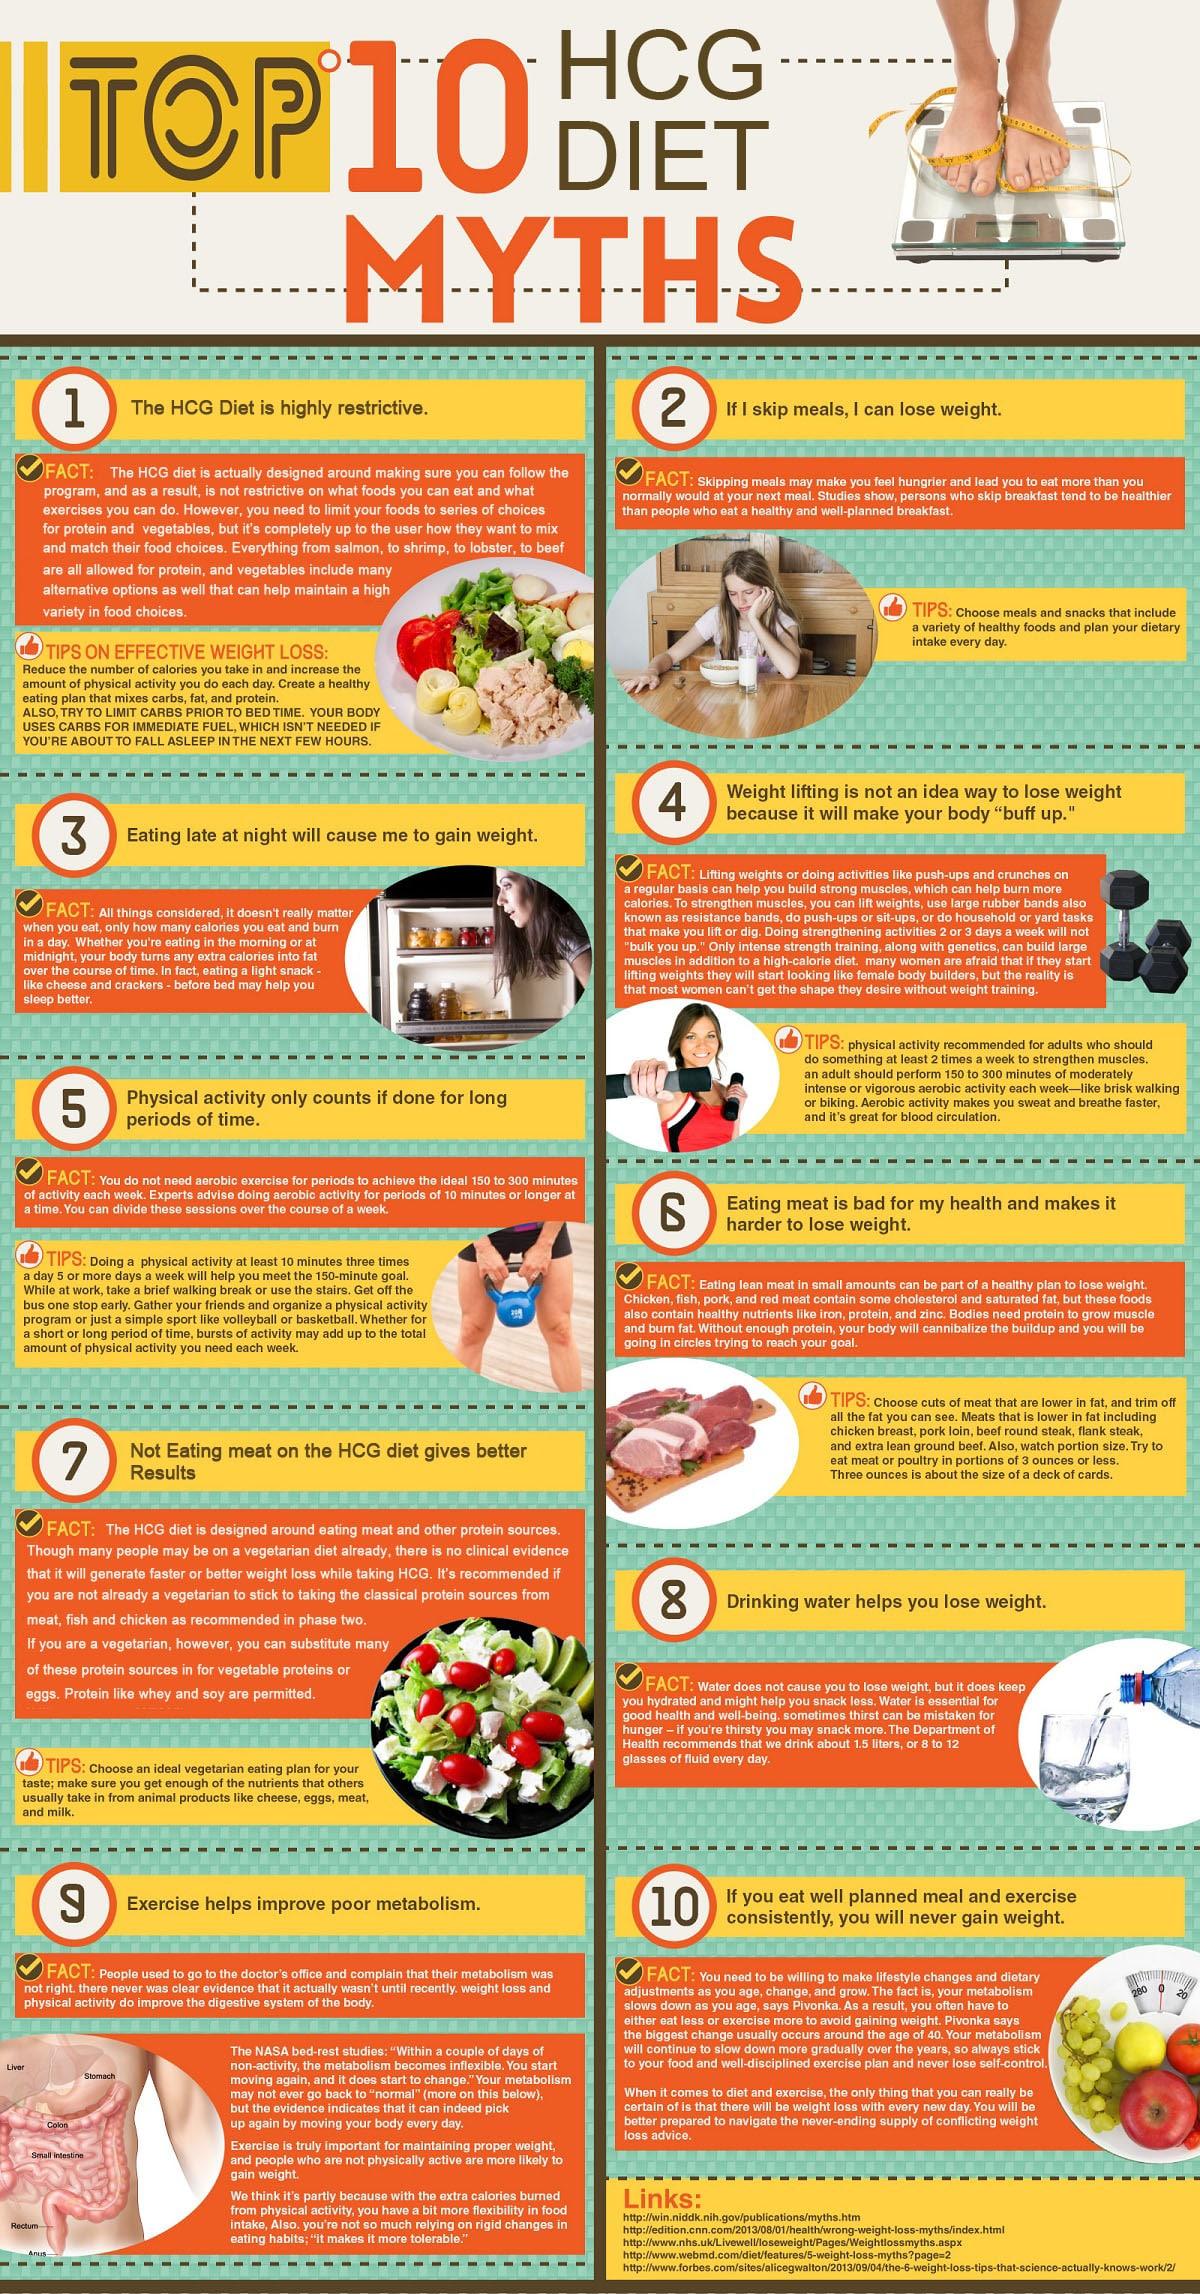 Top 10 HCG Diet Myths